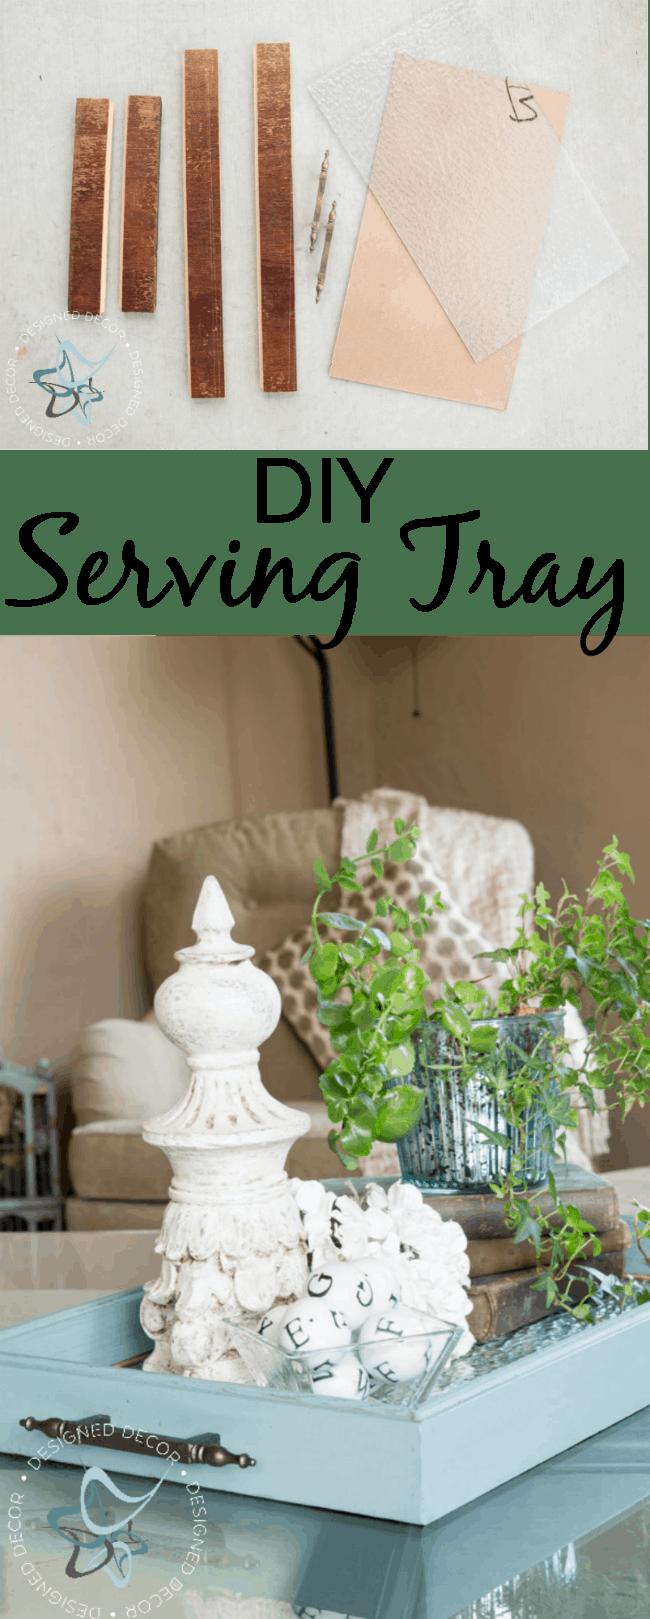 Diy - Serving Tray- Designed Decor